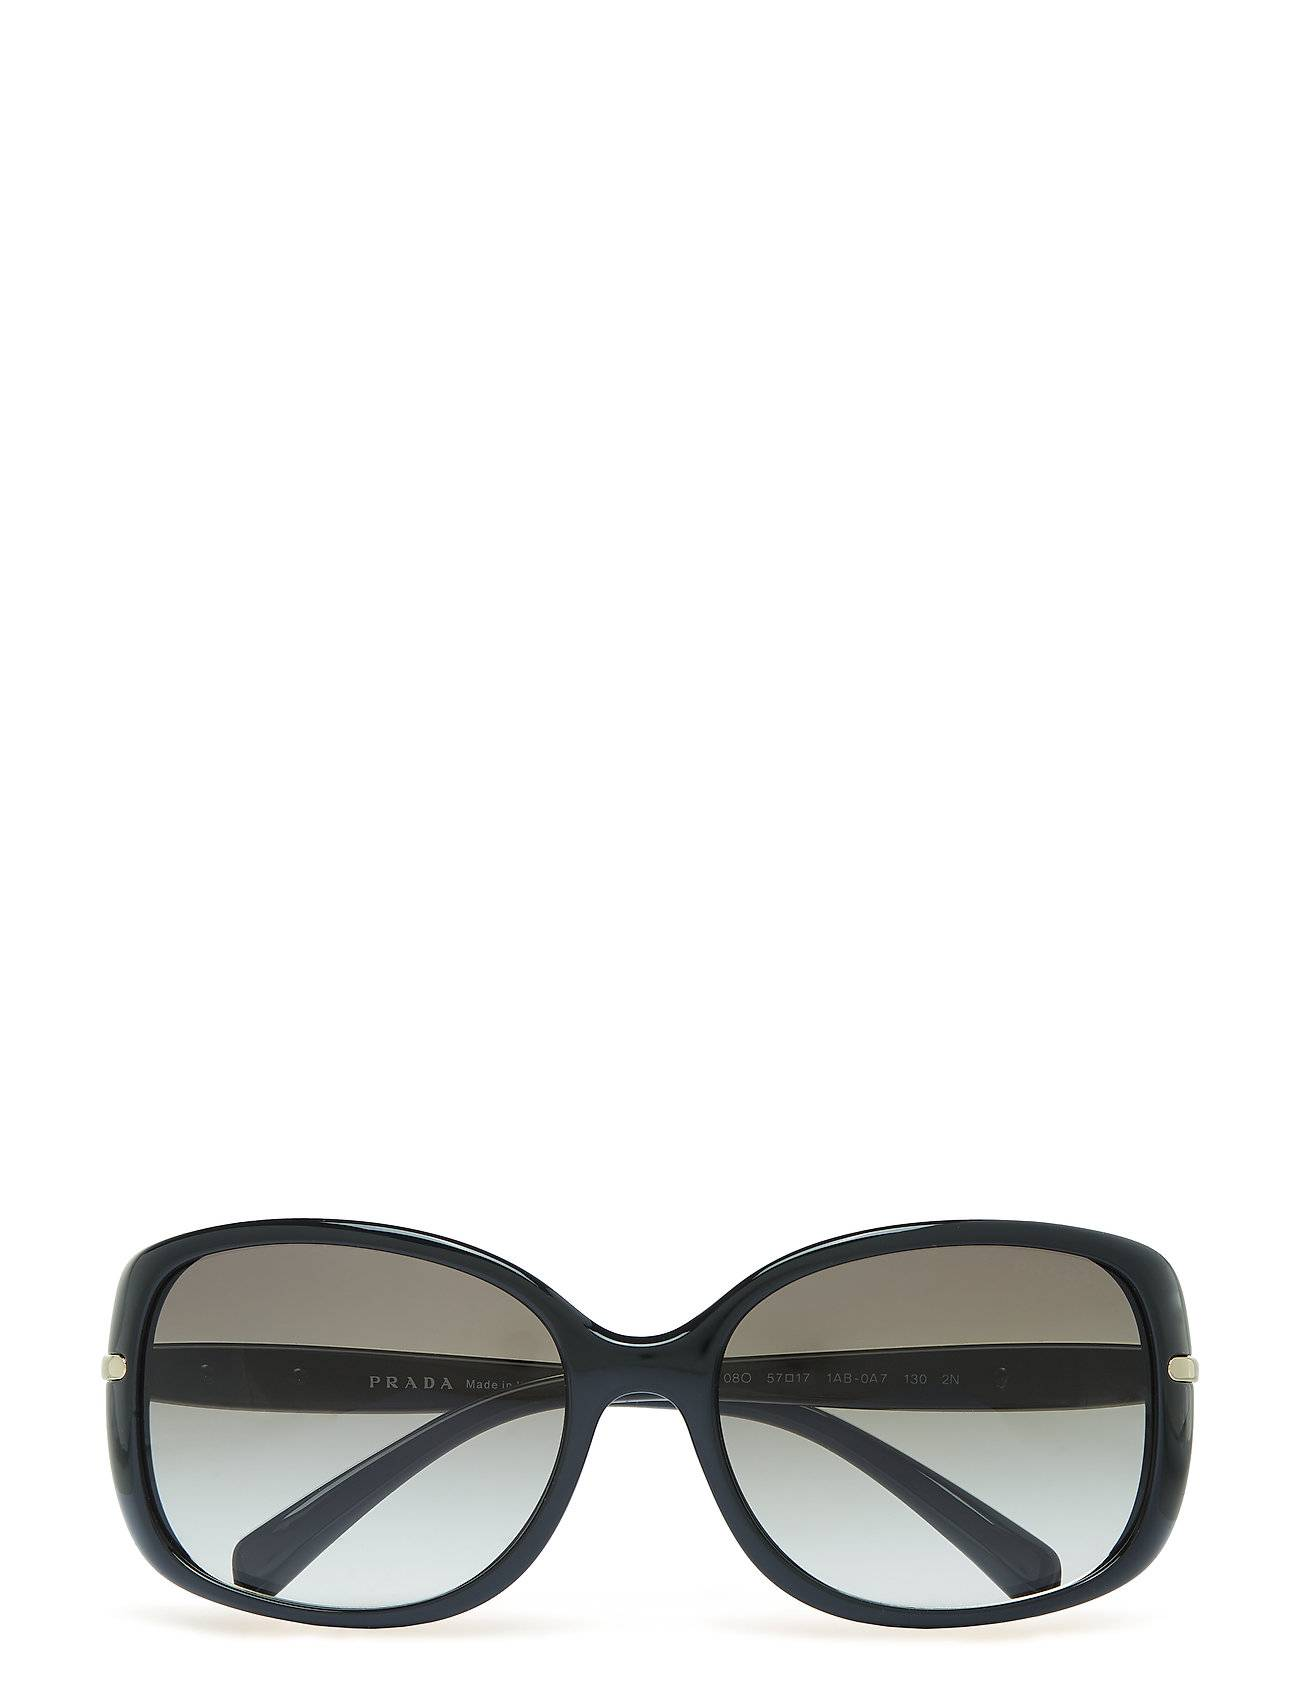 Image of Prada Sunglasses Conceptual   Arrow Wayfarer Aurinkolasit Musta